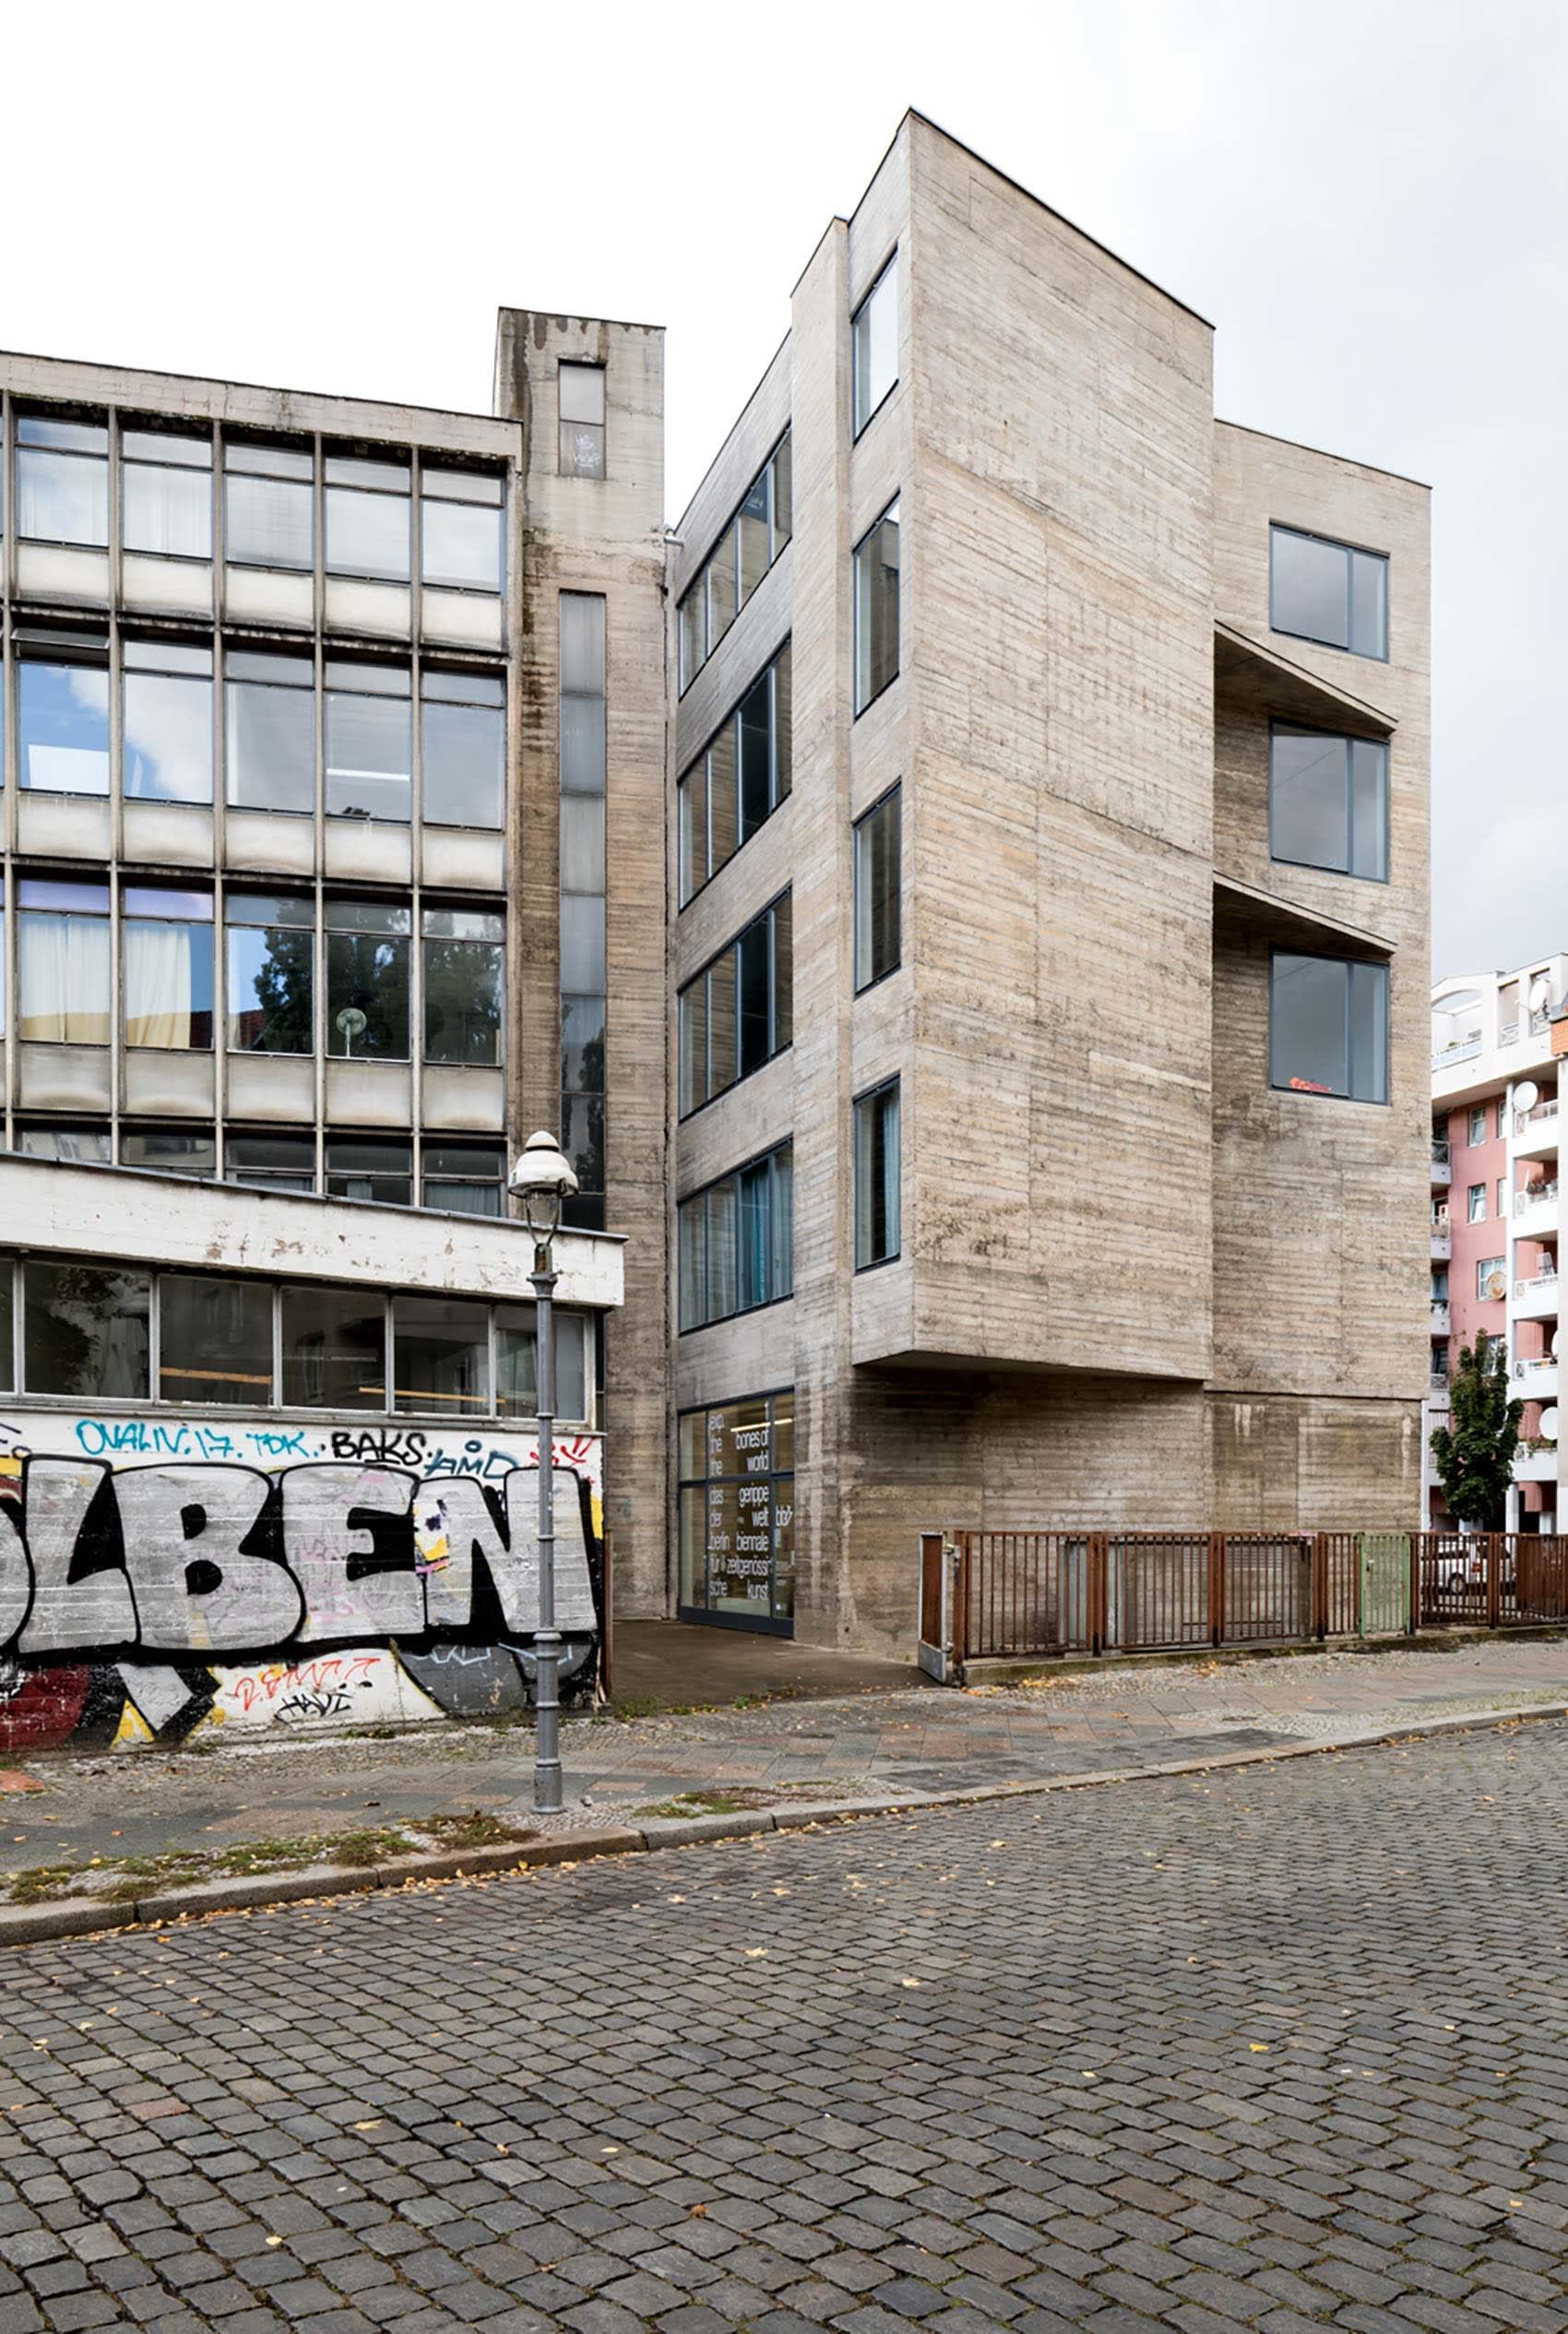 ex rota print, berlin